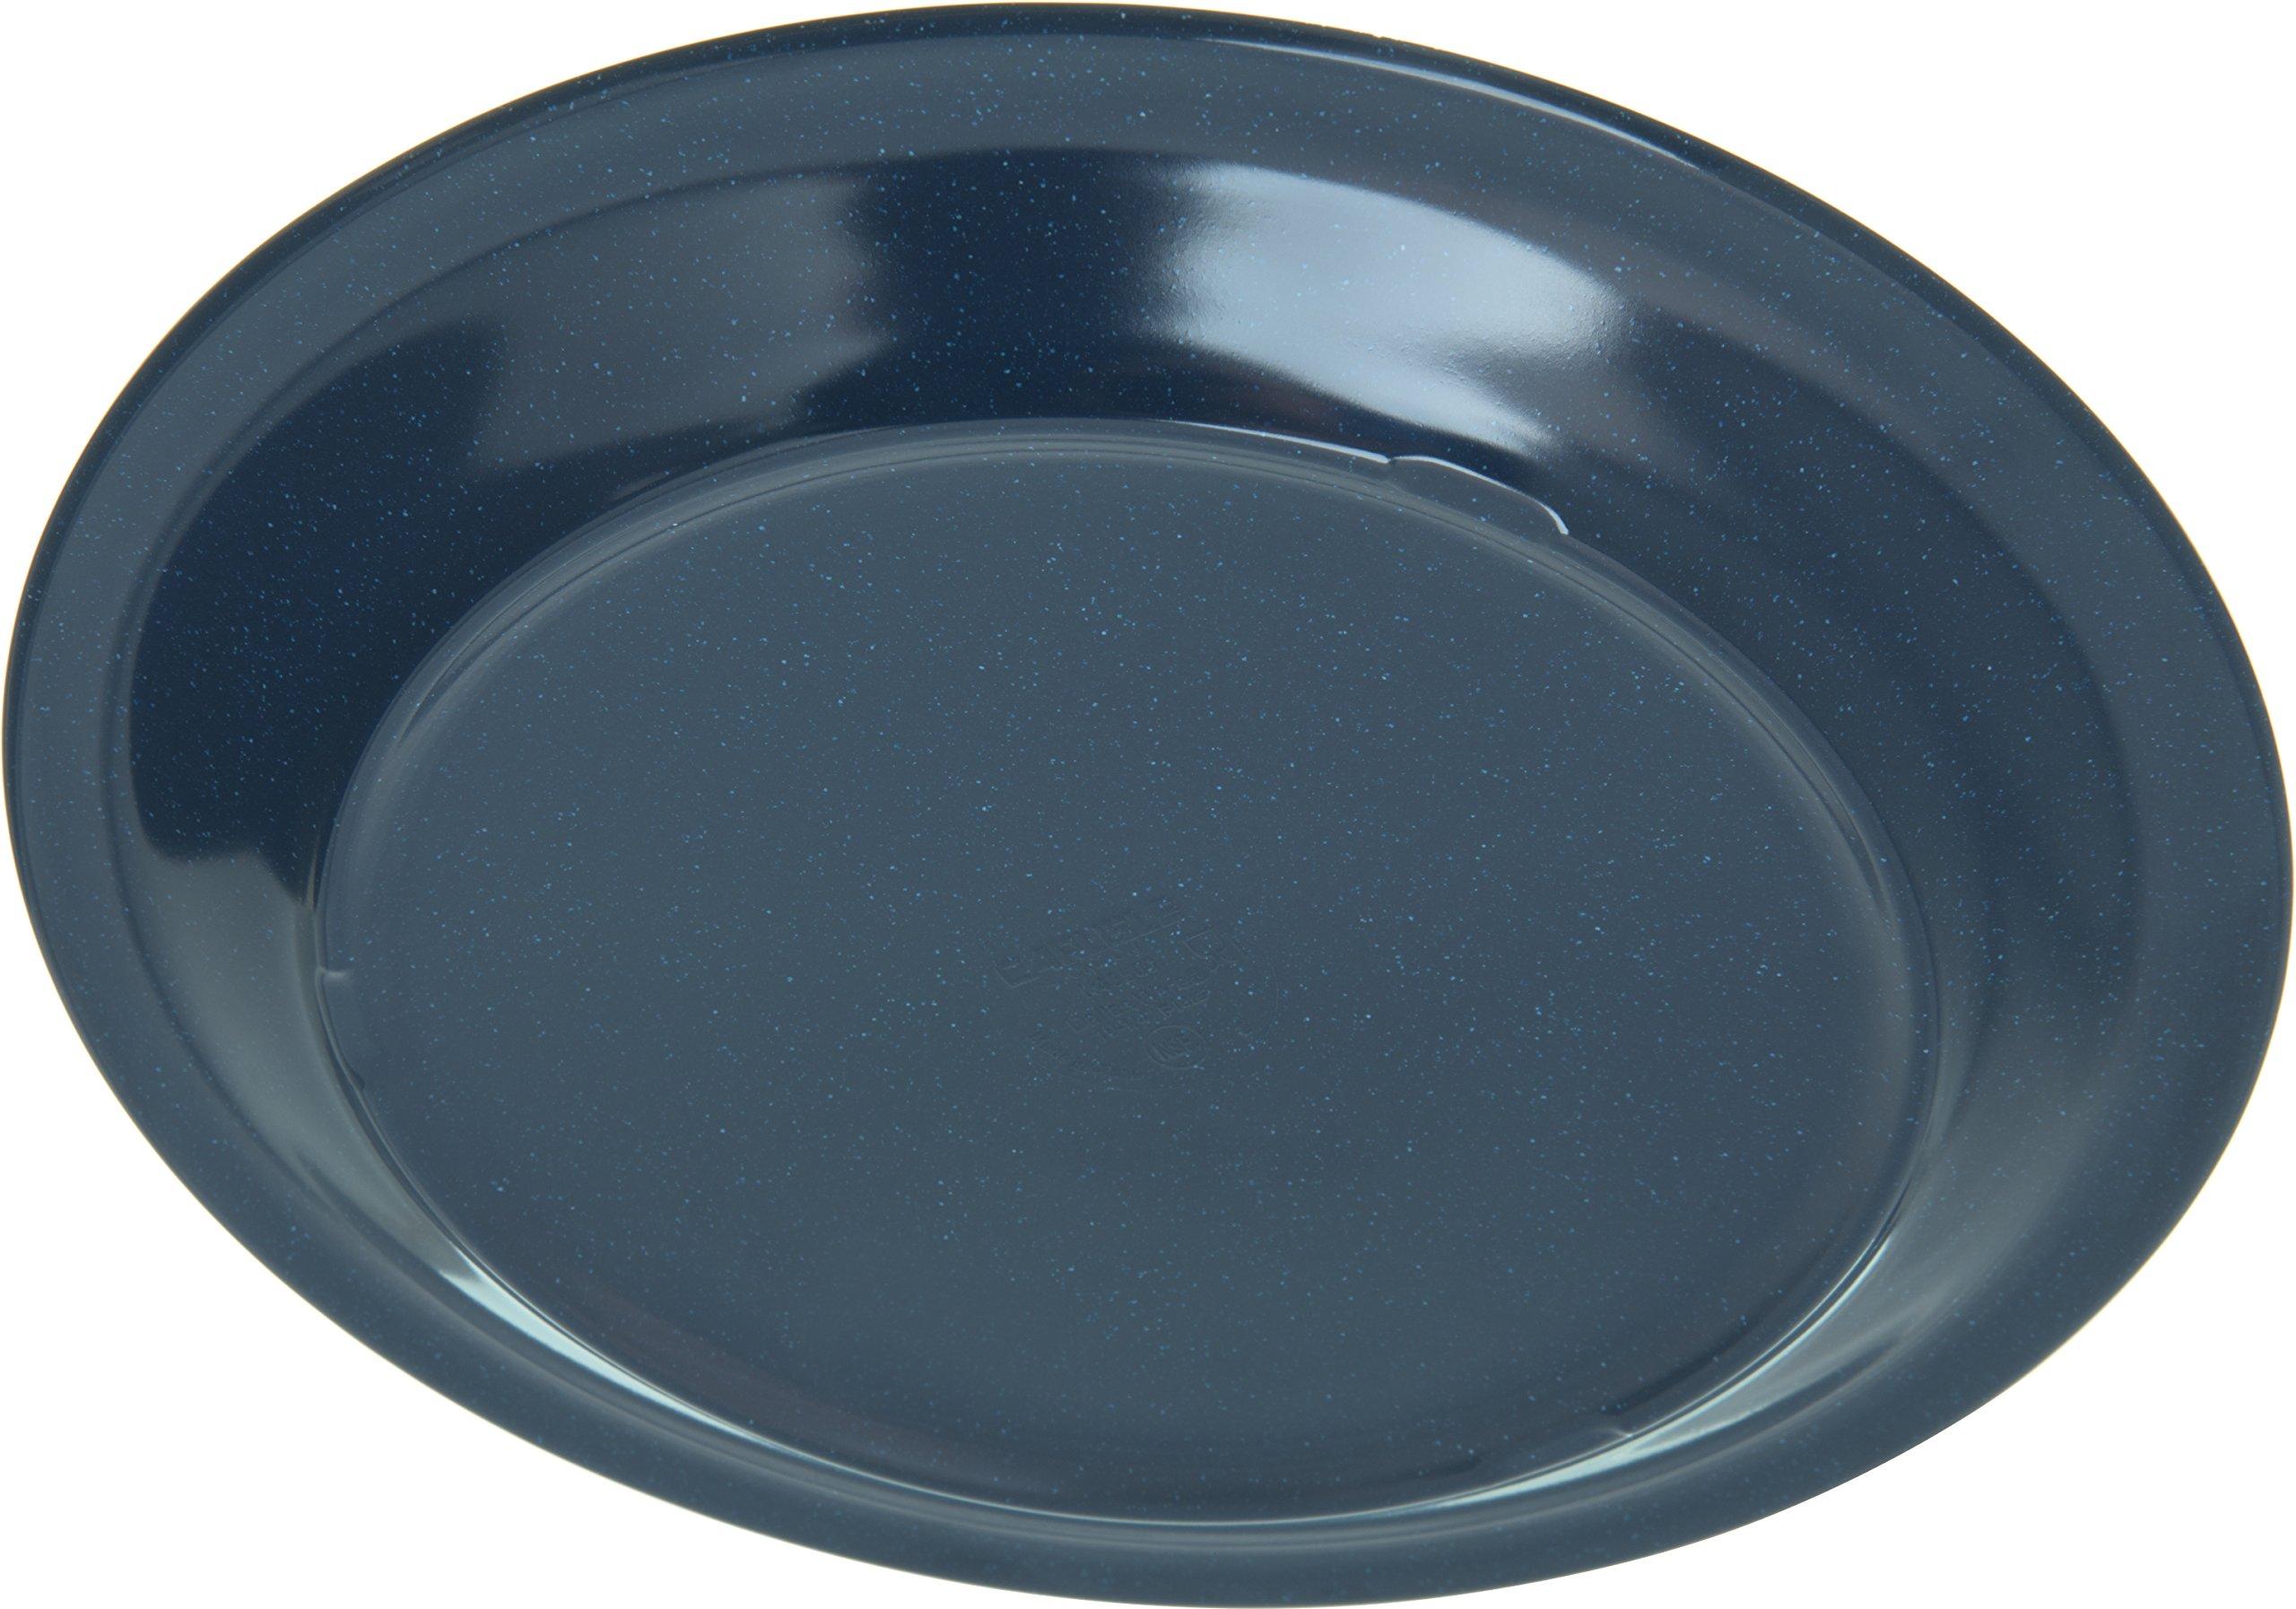 Carlisle 4350035 Dallas Ware Melamine Dinner Plate, 10.20'' Dia. x 0.84'' H, Cafe Blue (Case of 48) by Carlisle (Image #5)